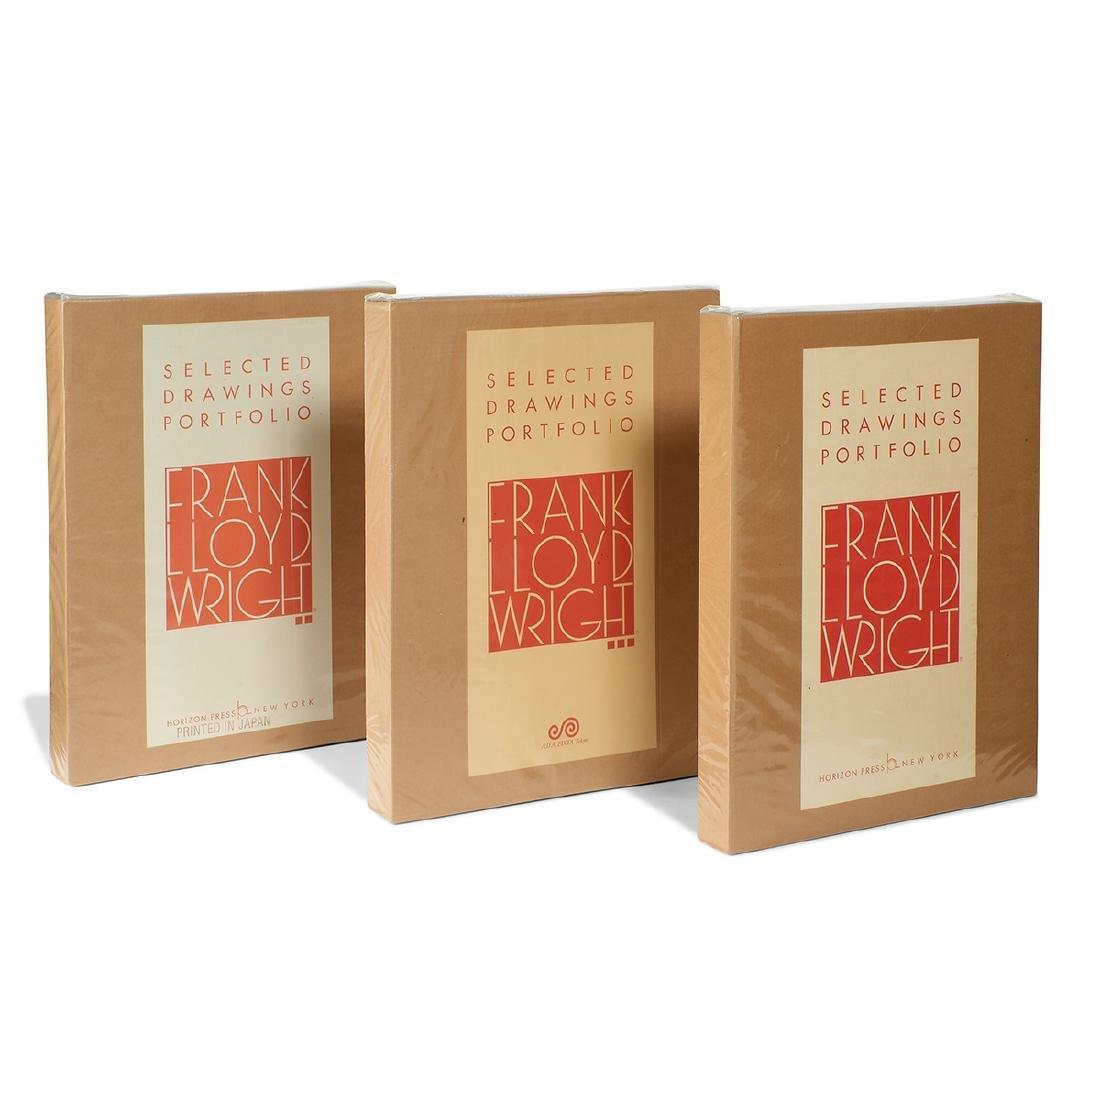 Frank Lloyd Wright, Selected Drawings Portfolio Set